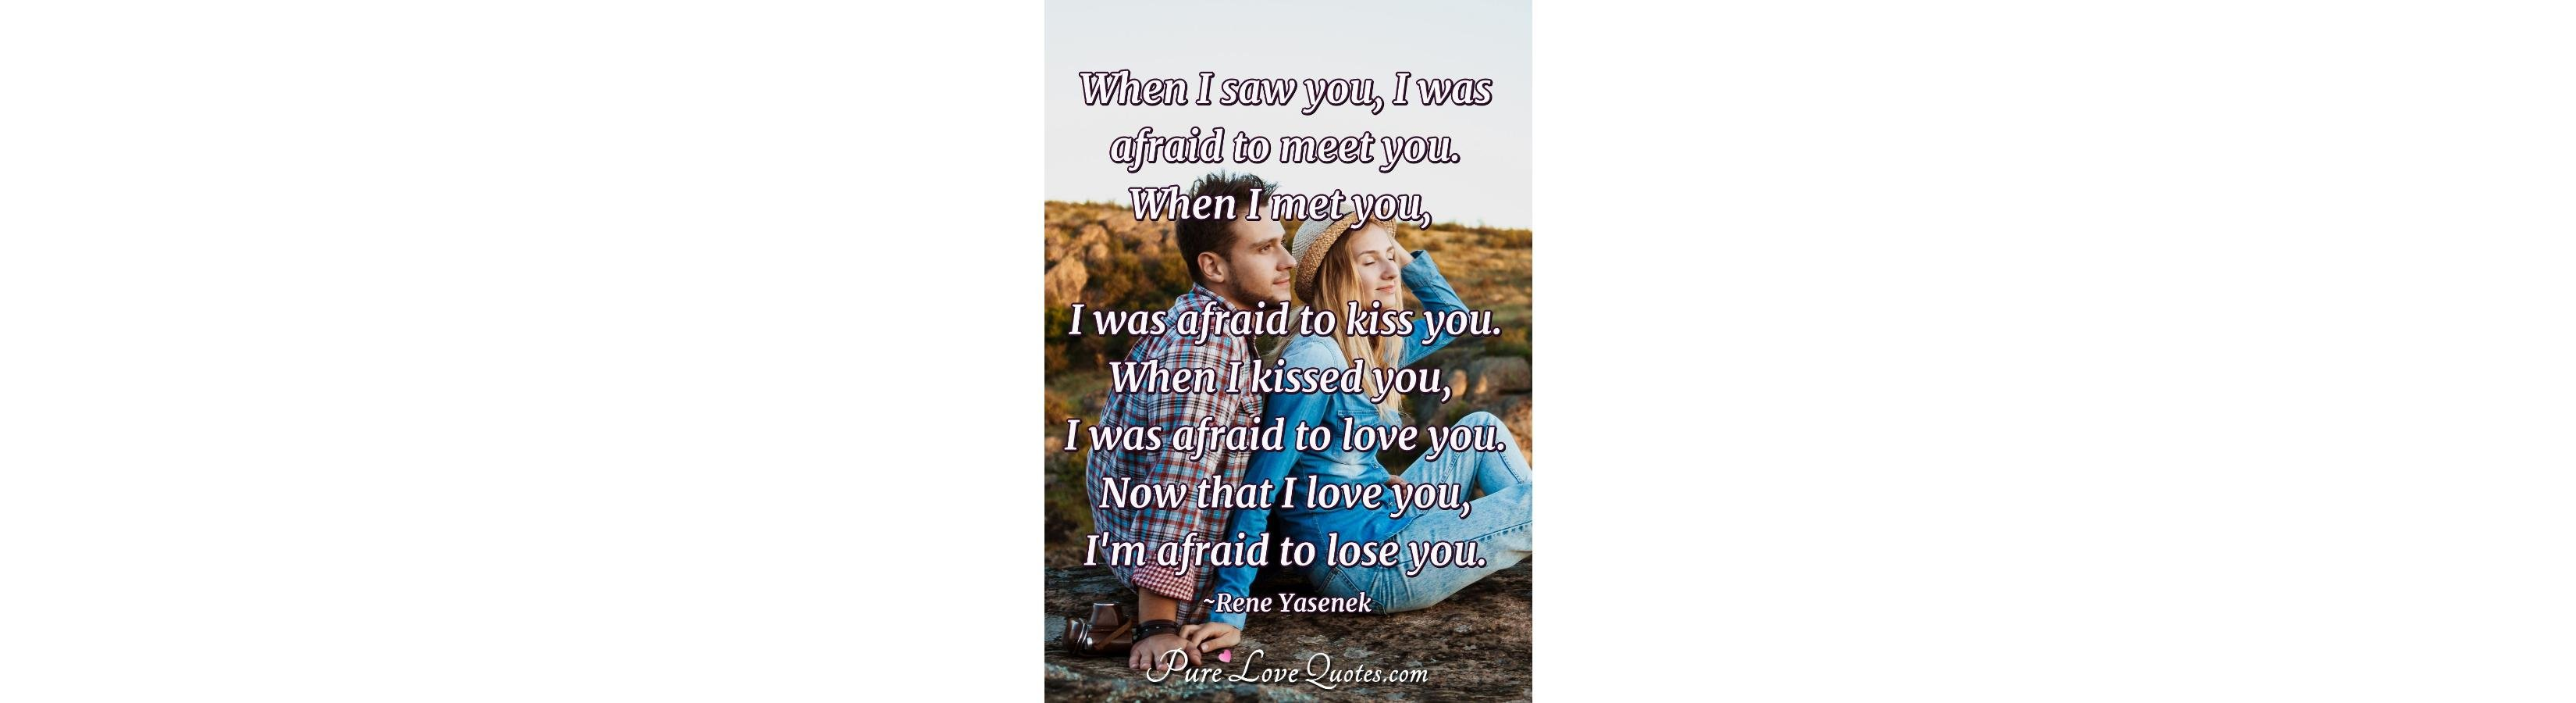 When i saw you i was afraid to meet you